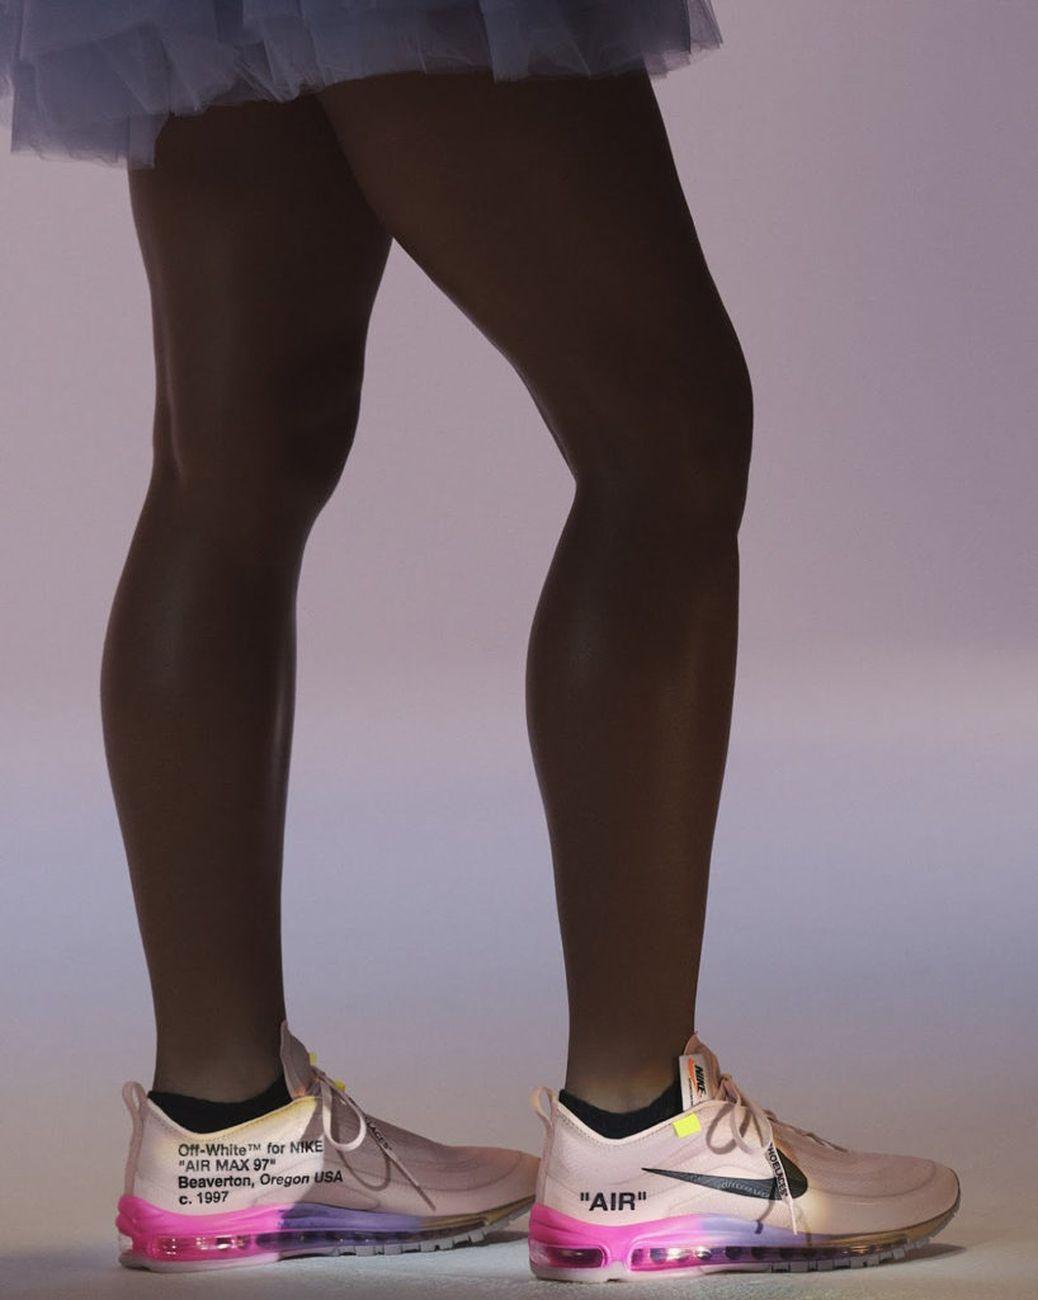 100% authentic abb37 cadc7 Nike Off White. Serena Williams. 2018